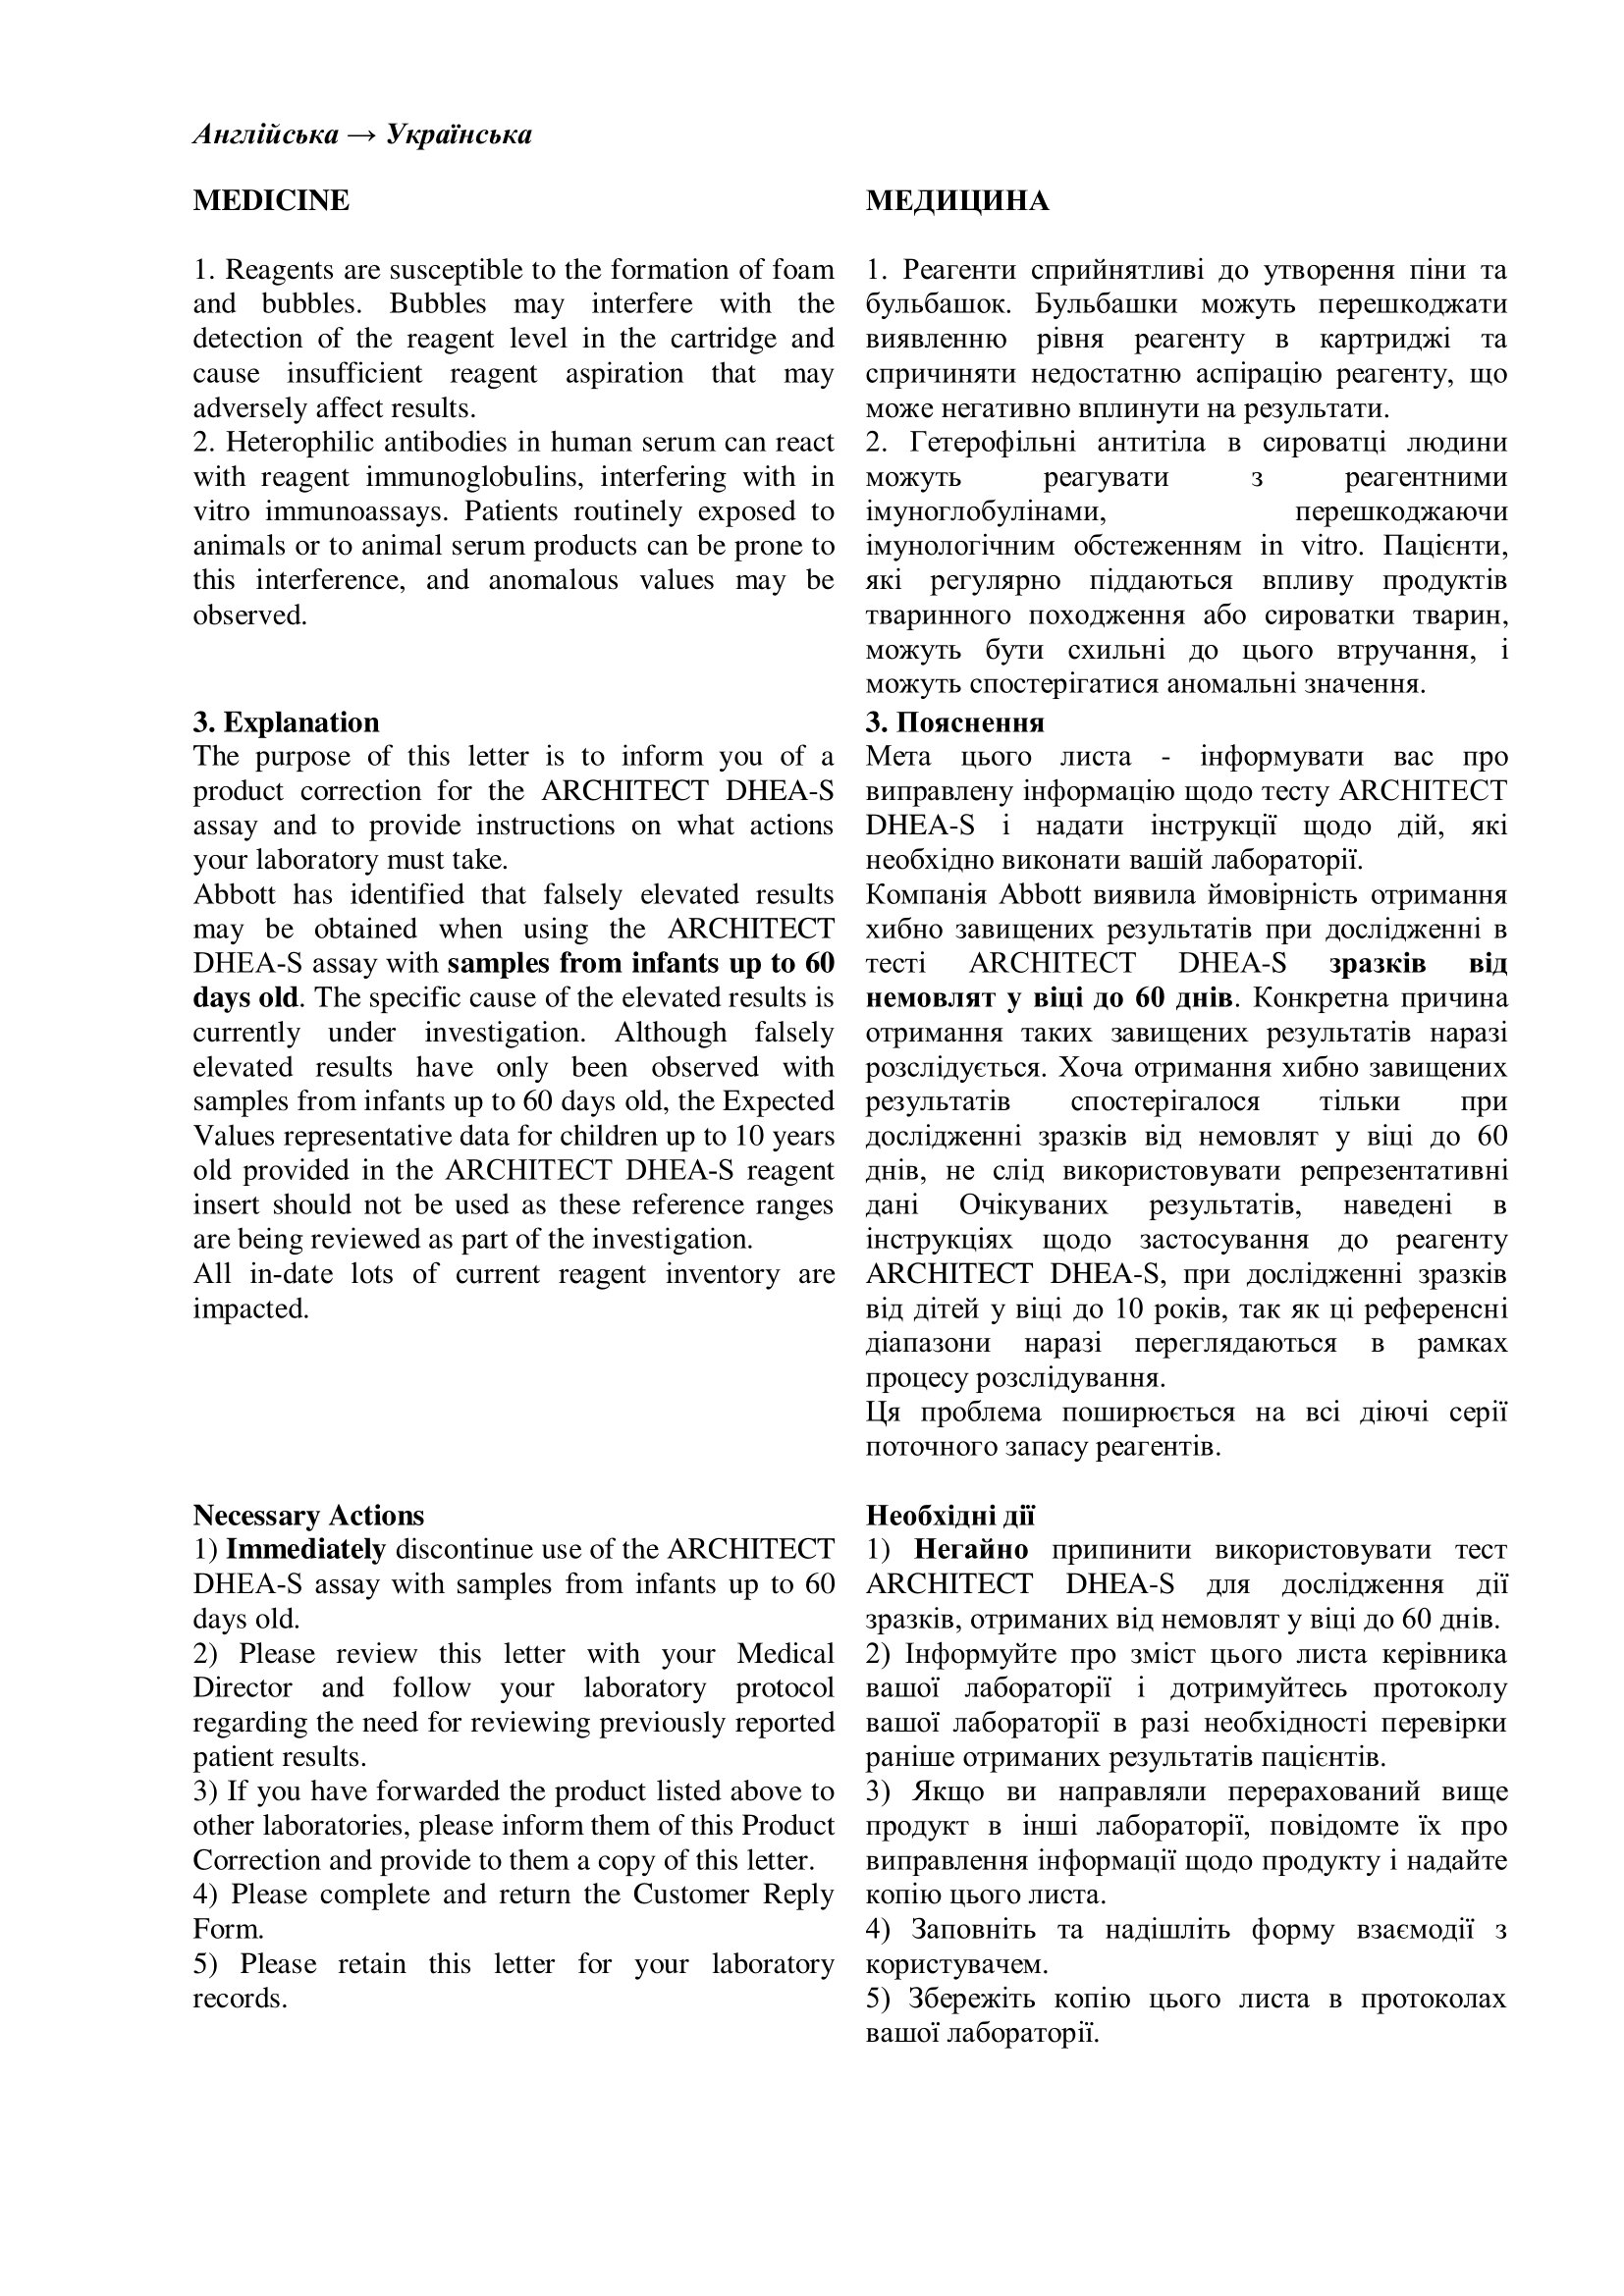 Фото Перевод медицинского текста с английского на украинский